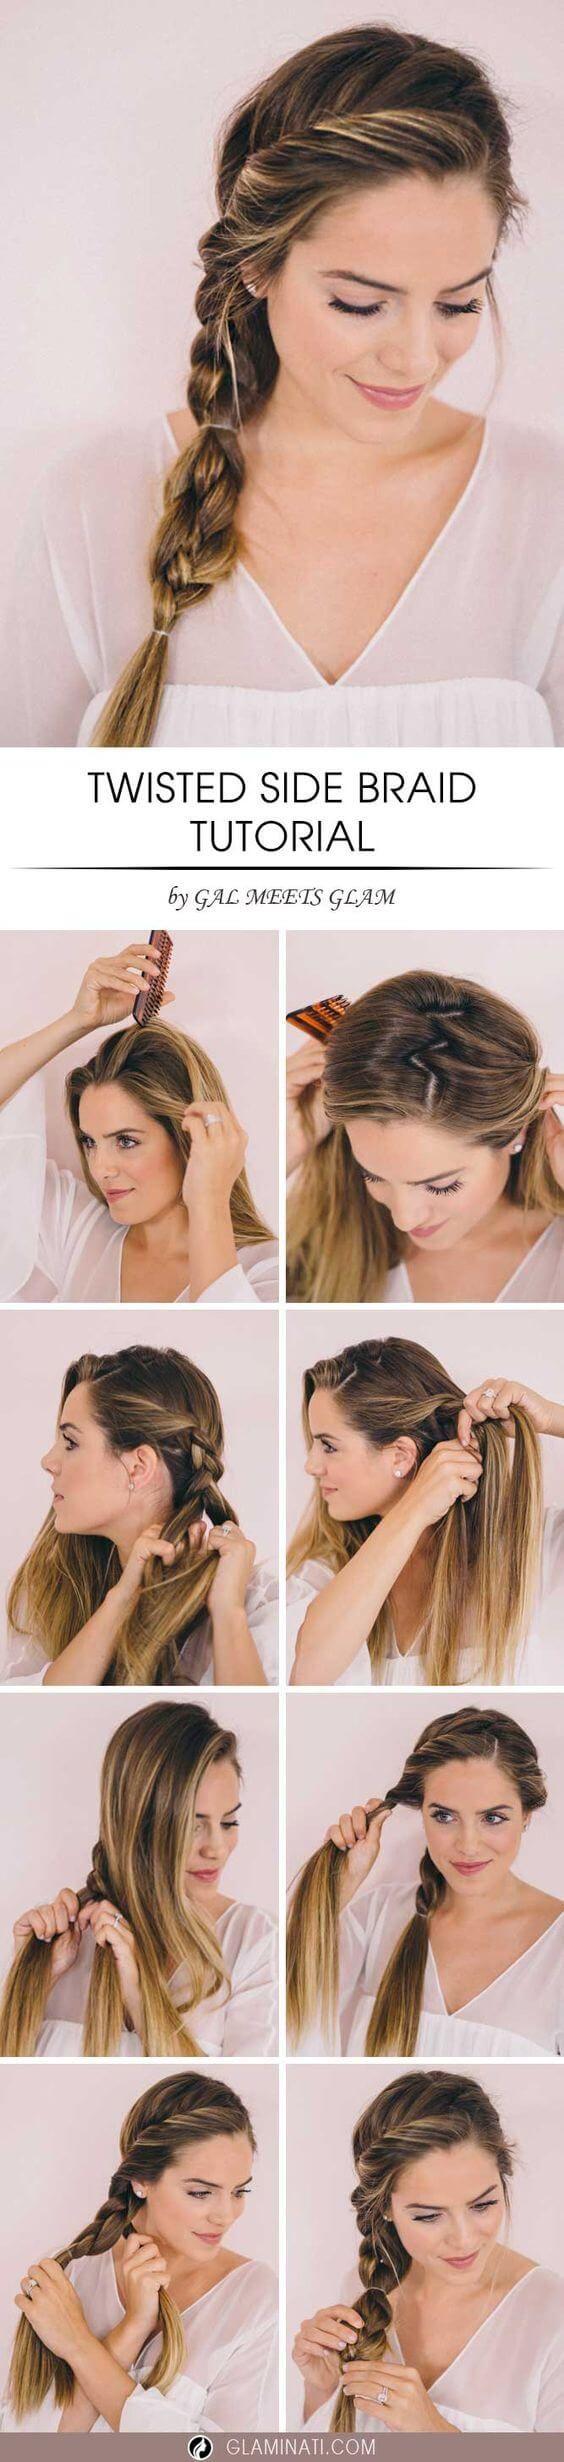 31 spezielle Festival Frisuren - Neue Damen Frisuren #coolgirlhairstyles